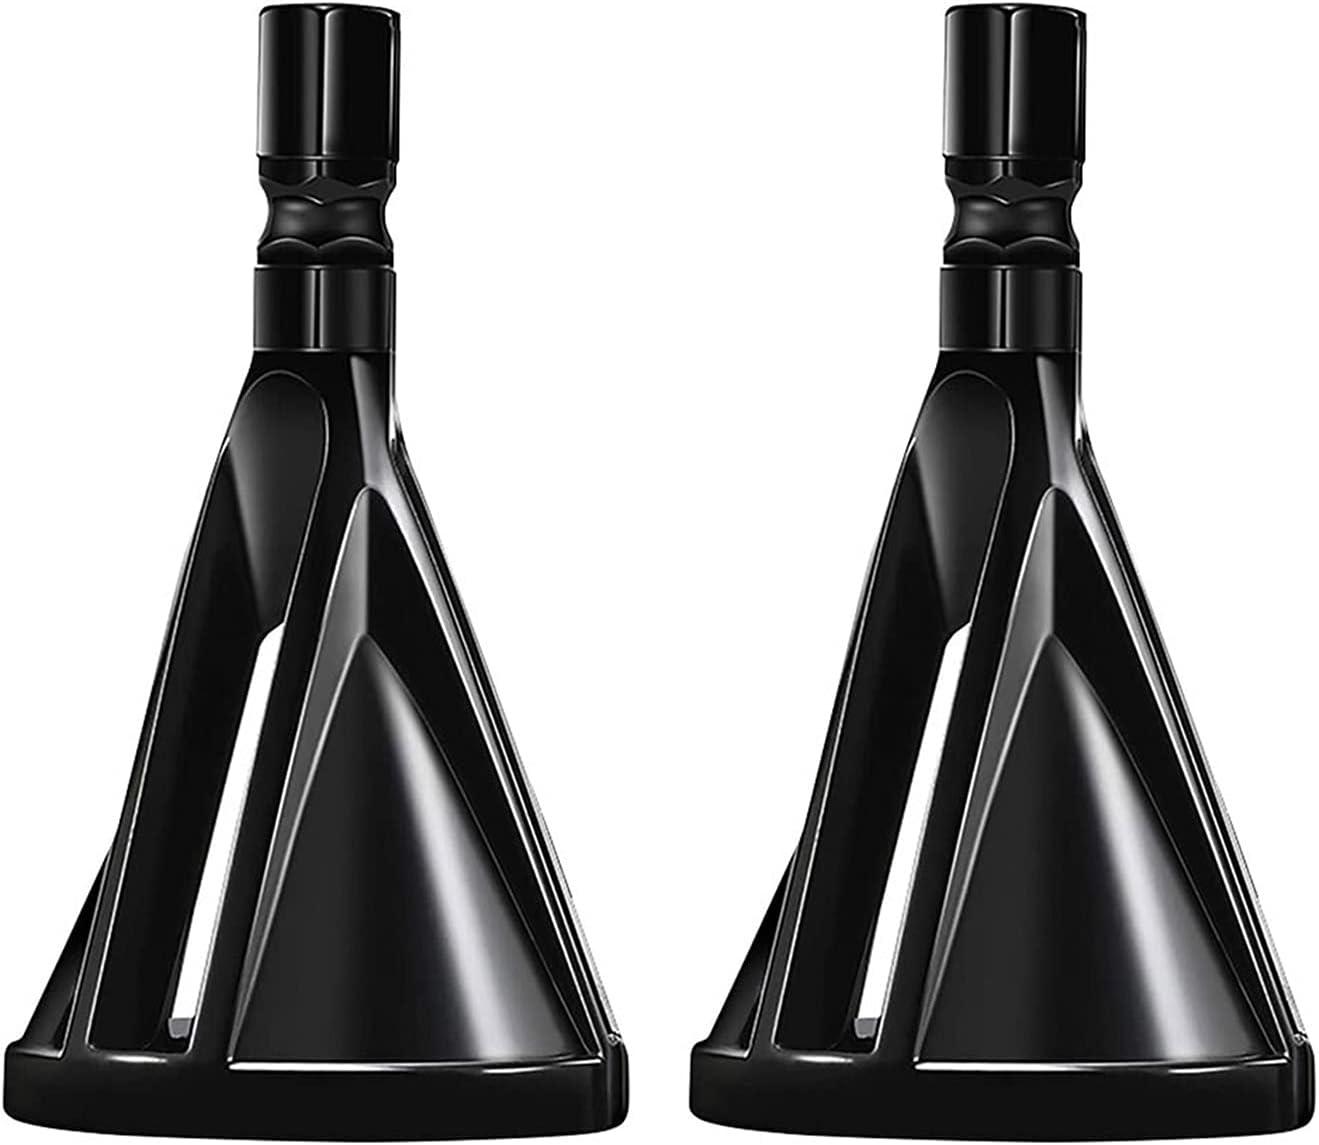 KESHIKUI New MEI Cheap sale 2PCS Deburring Tools Chamfer quality assurance High External Spee